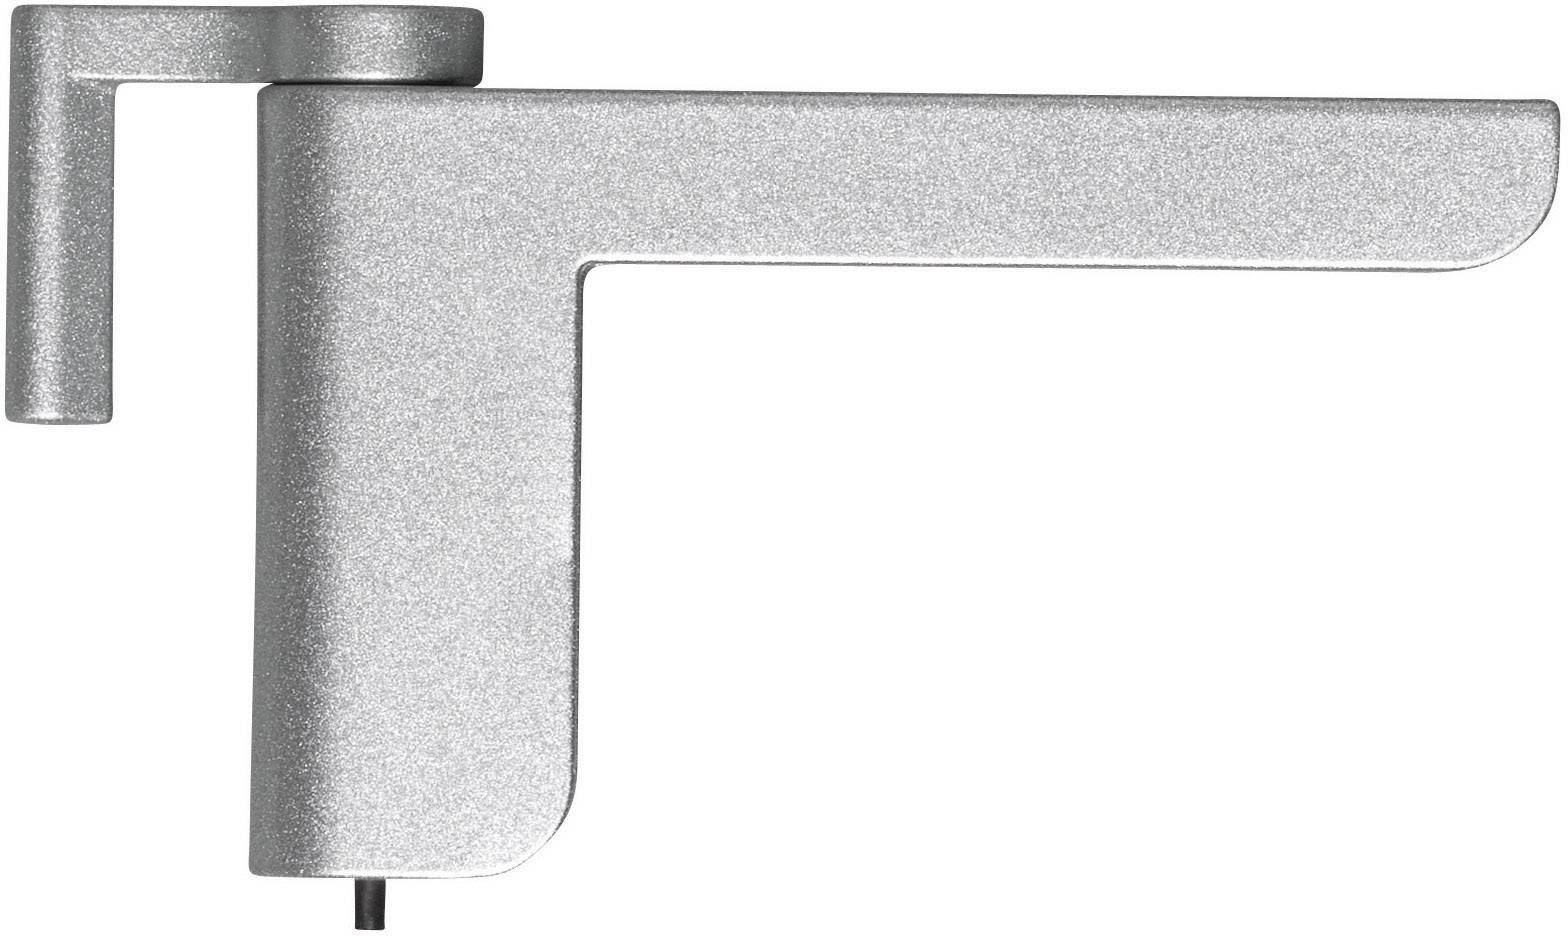 Dveřní minizavírač ABUS 2603 SABTS44182, stříbrný